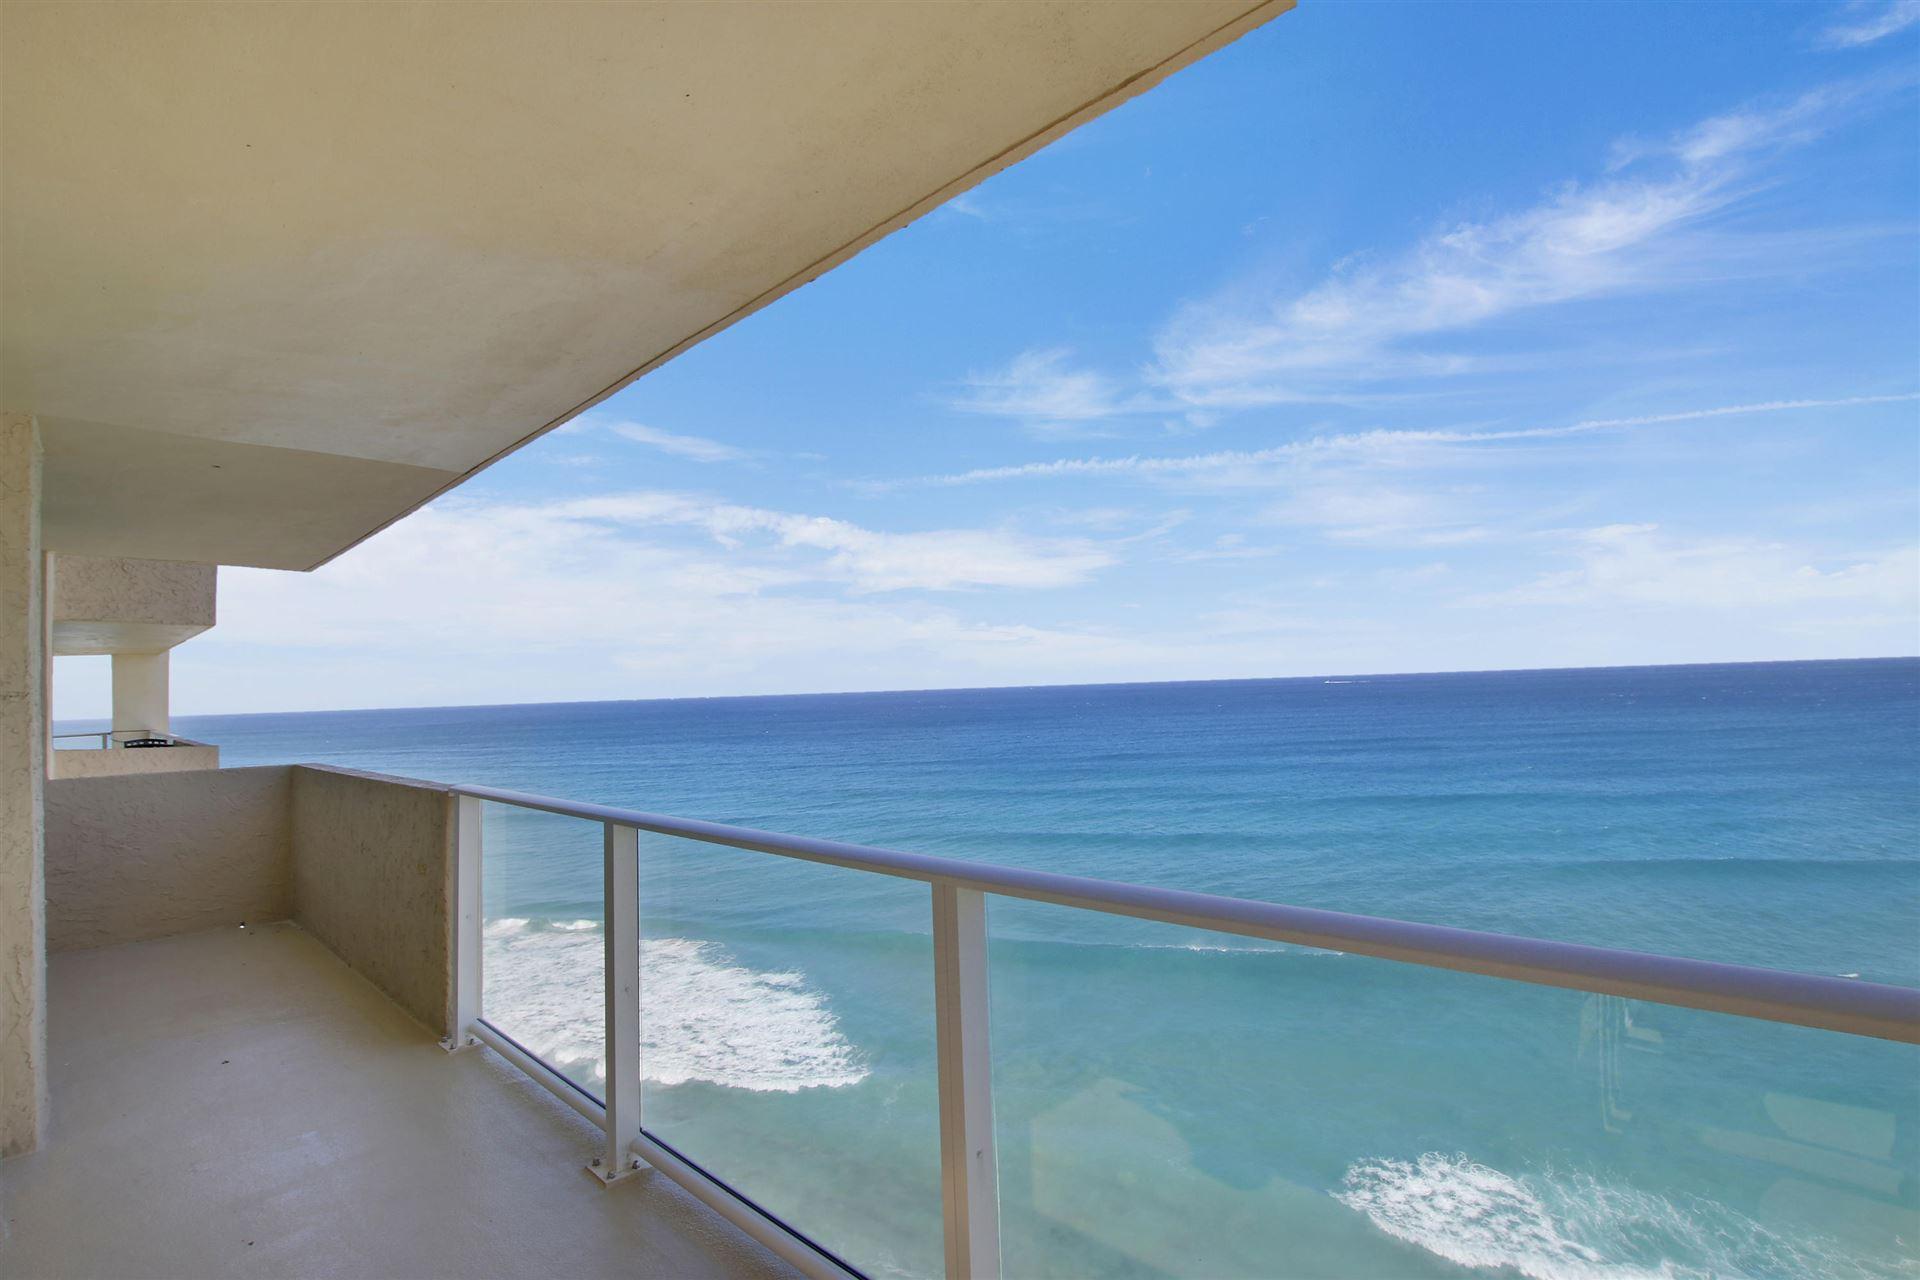 5440 N Ocean Drive #1203, Singer Island, FL 33404 - #: RX-10648859